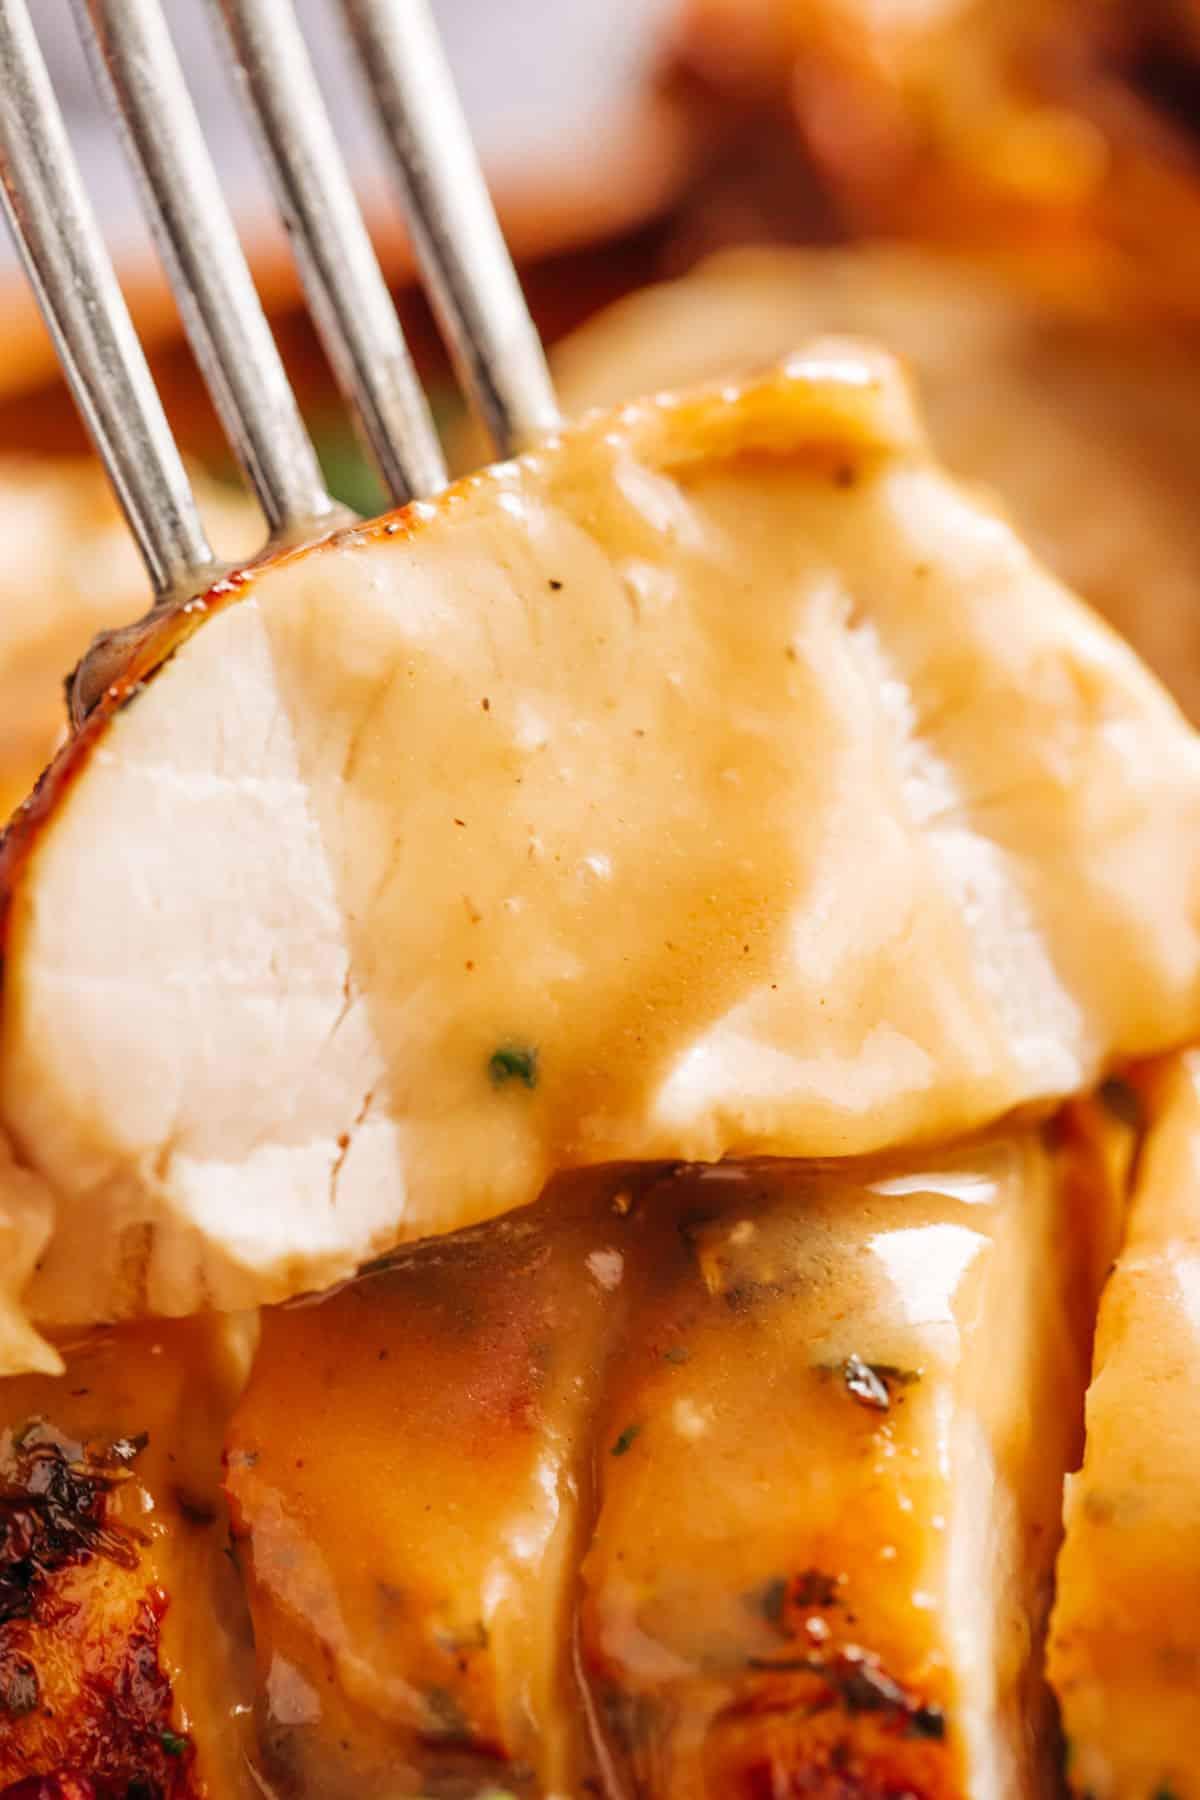 A slice of Turkey with homemade gravy